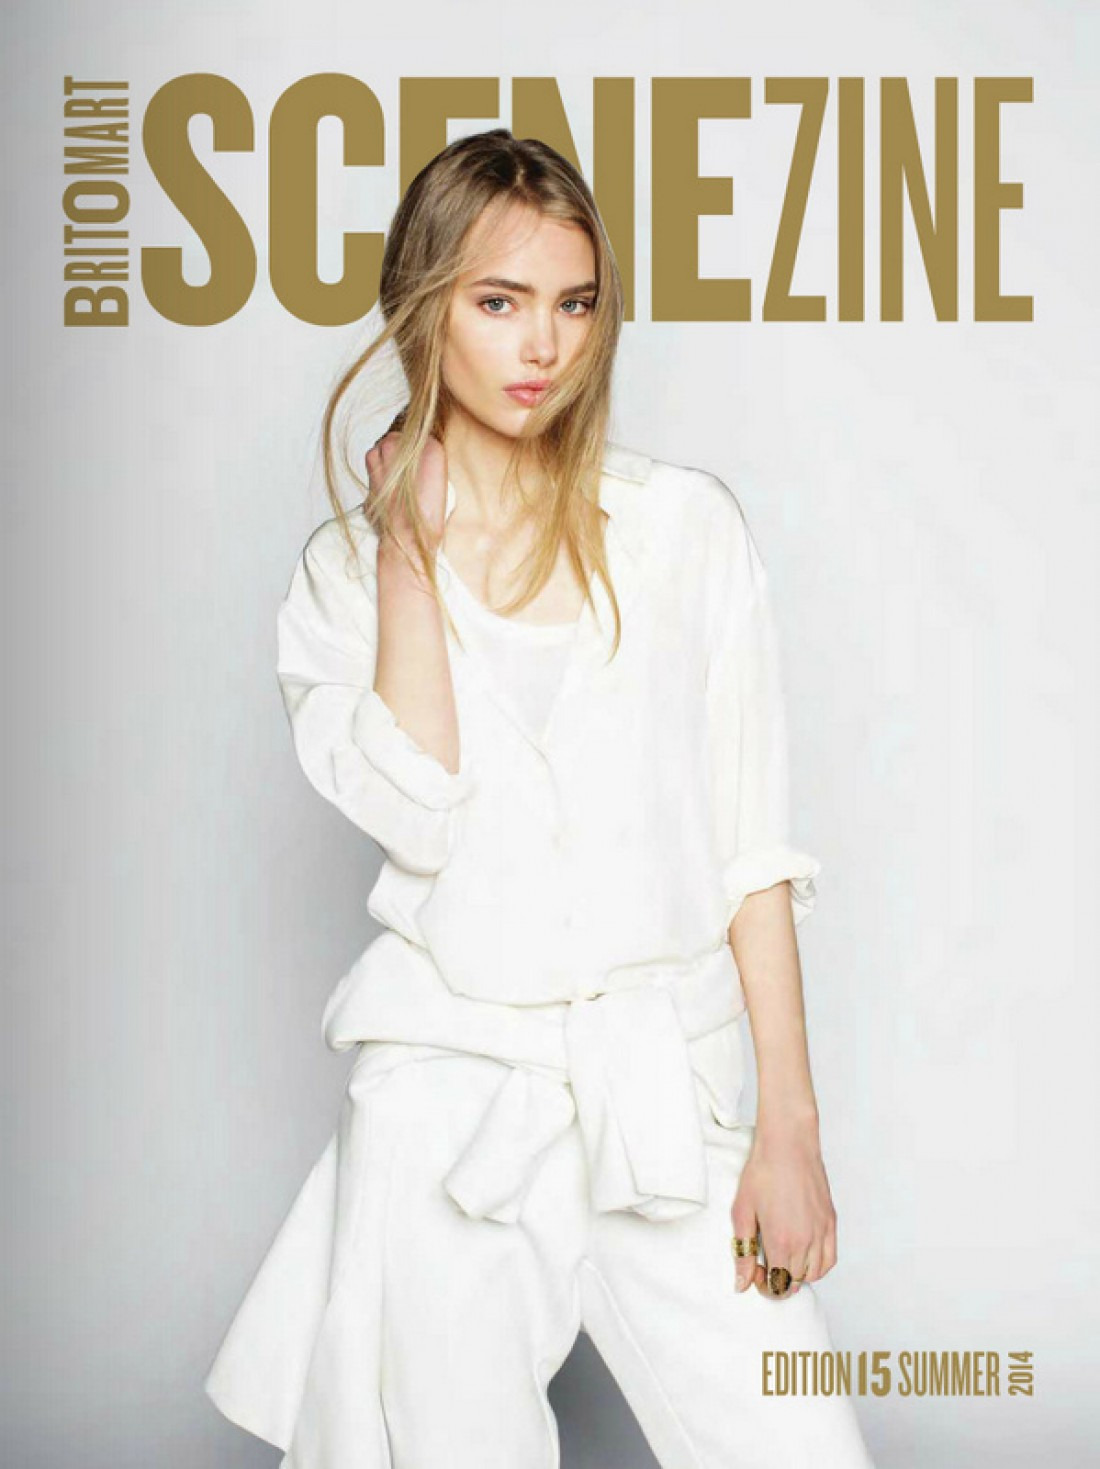 Marnie for SCENZINE shot by Olivia Hemus, styling by Rachel Morton